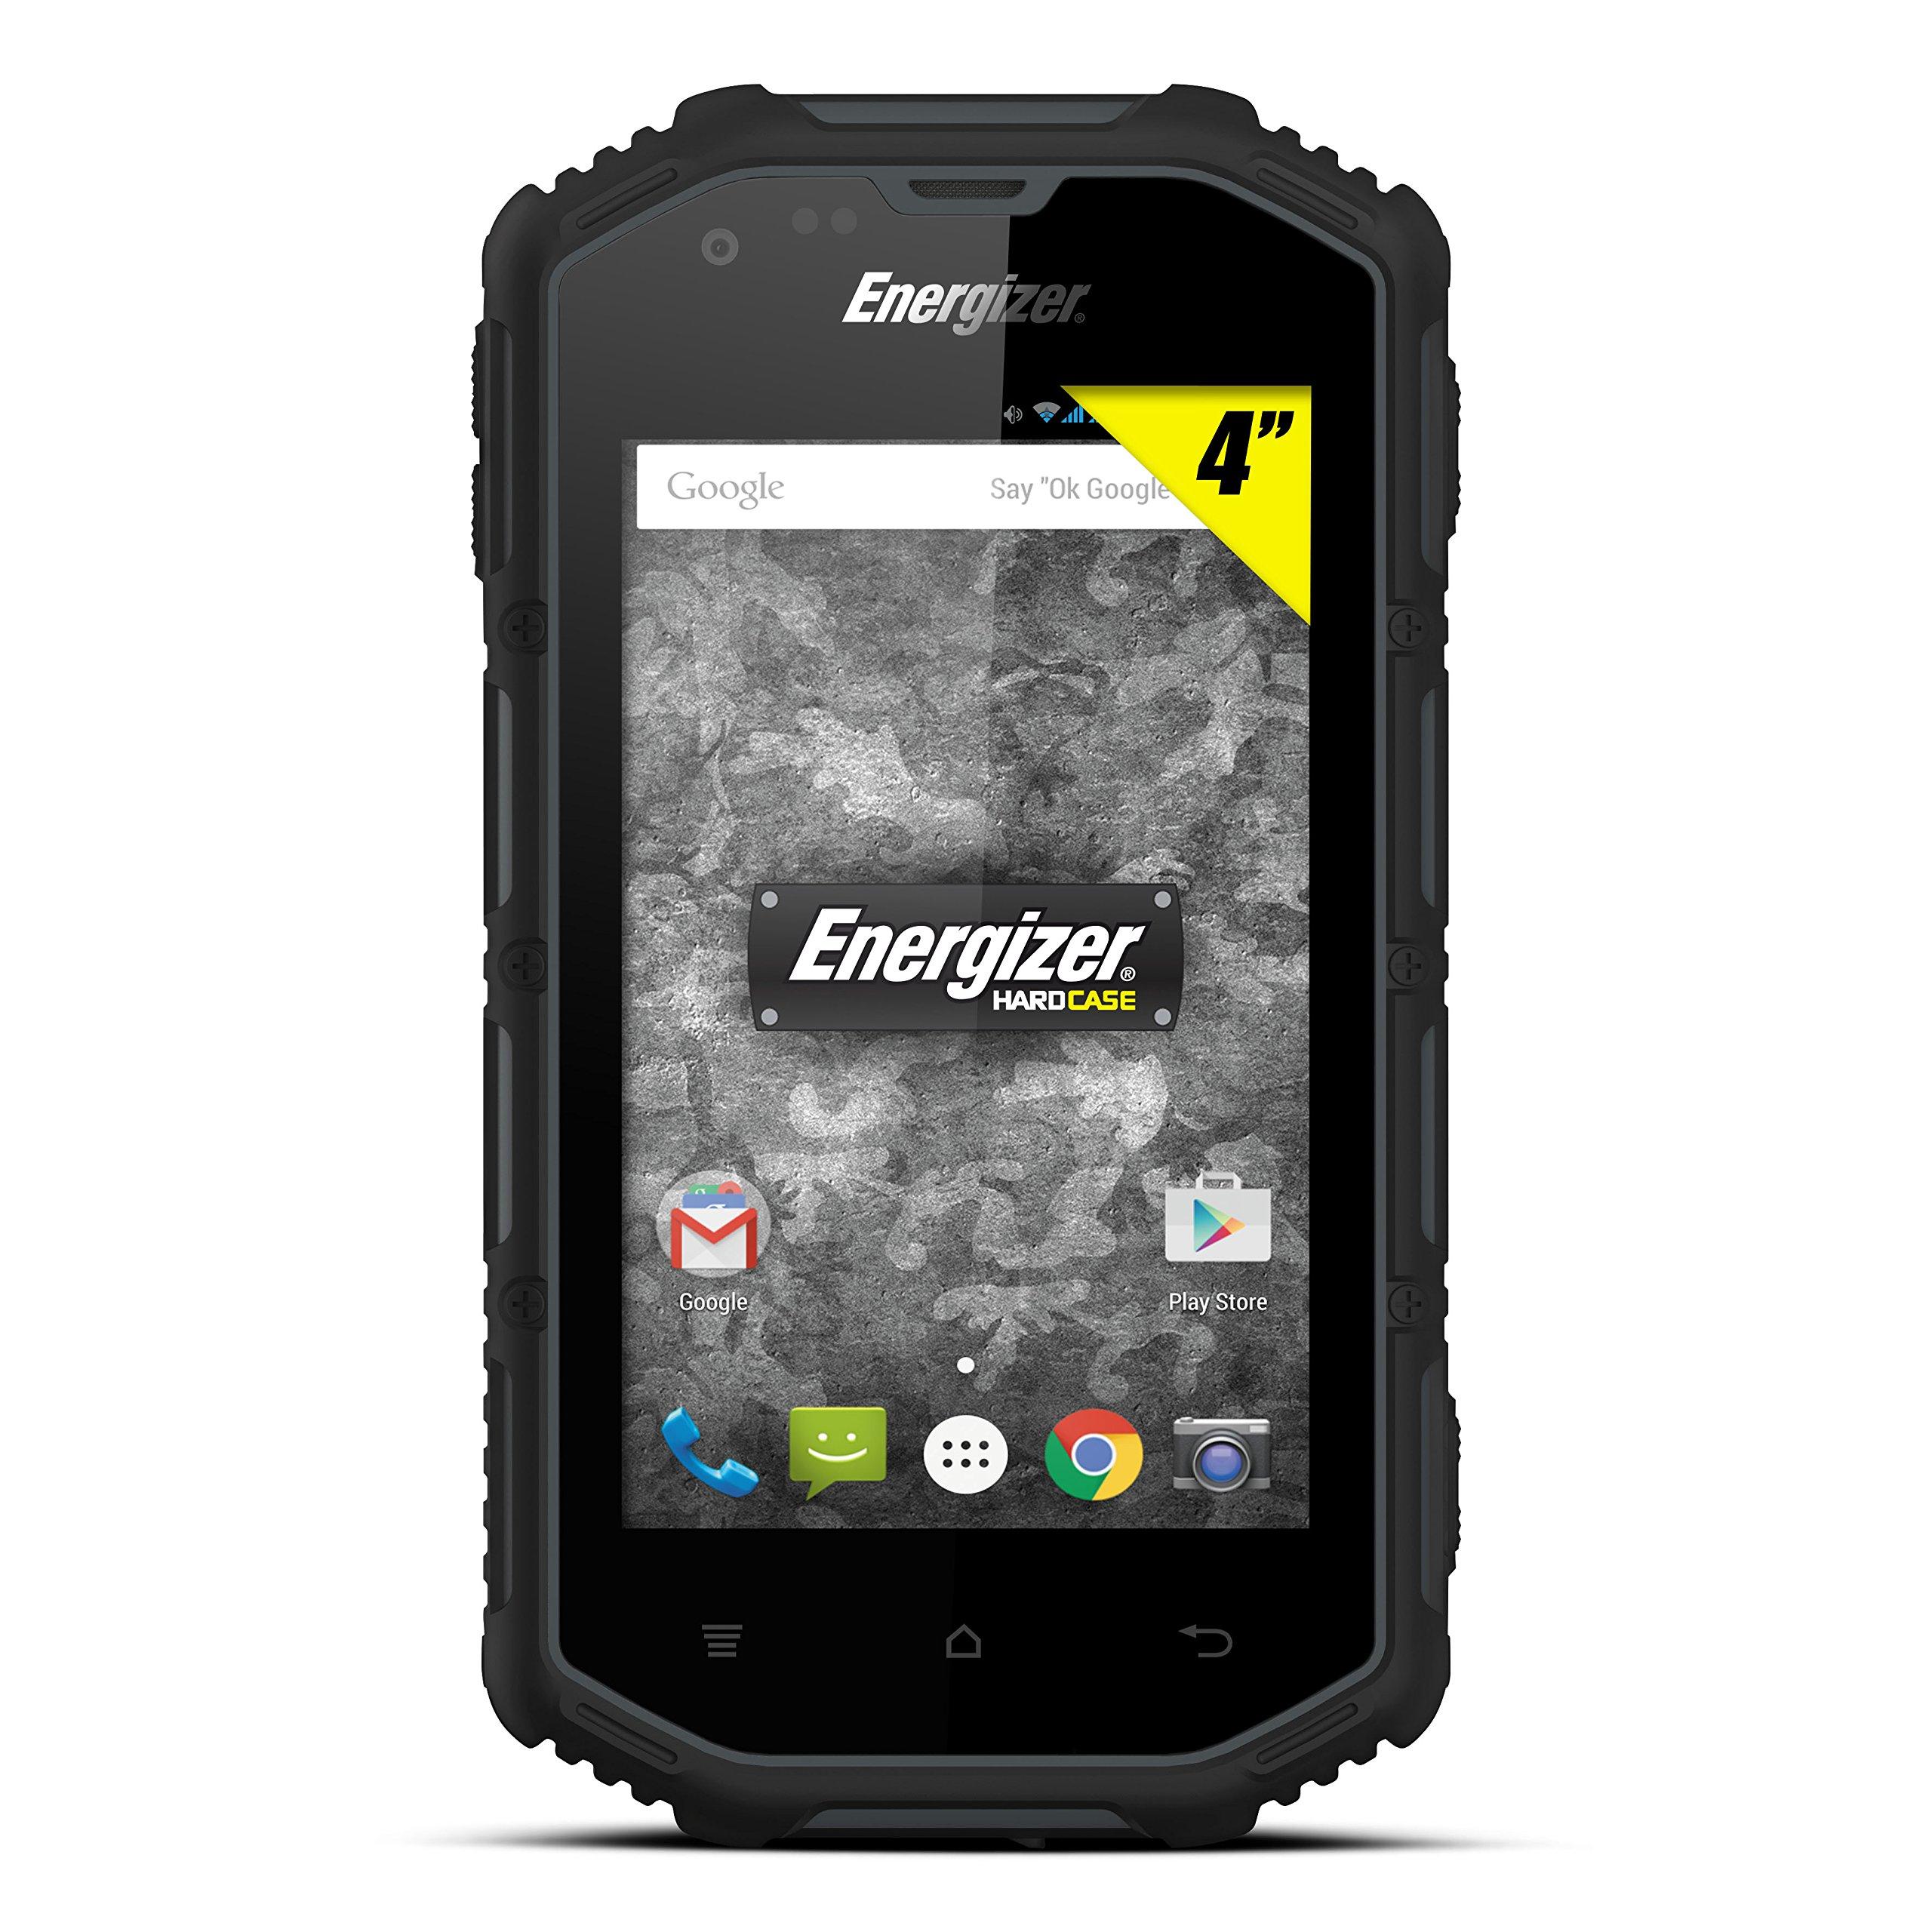 Energizer Smartphone teléfono móvil Energy 400, Negro: Amazon.es ...